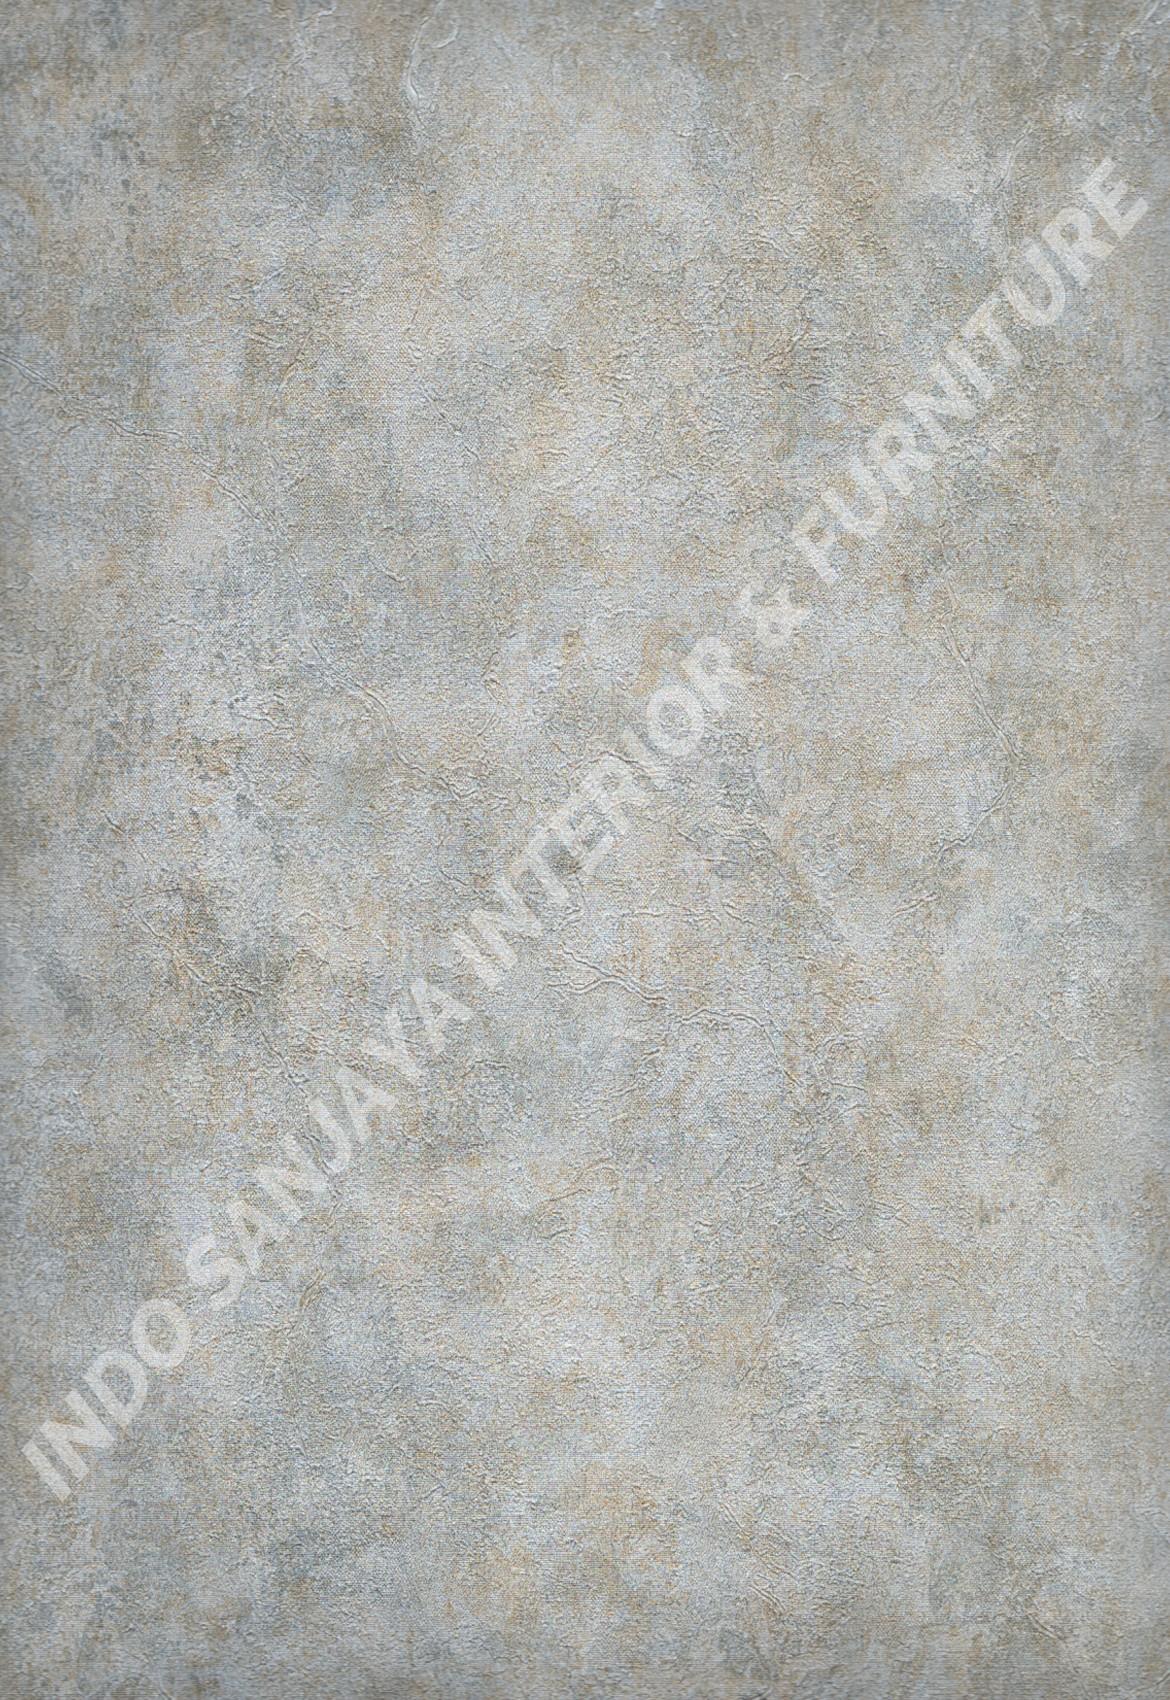 wallpaper   Wallpaper Minimalis Polos DL12009:DL12009 corak  warna